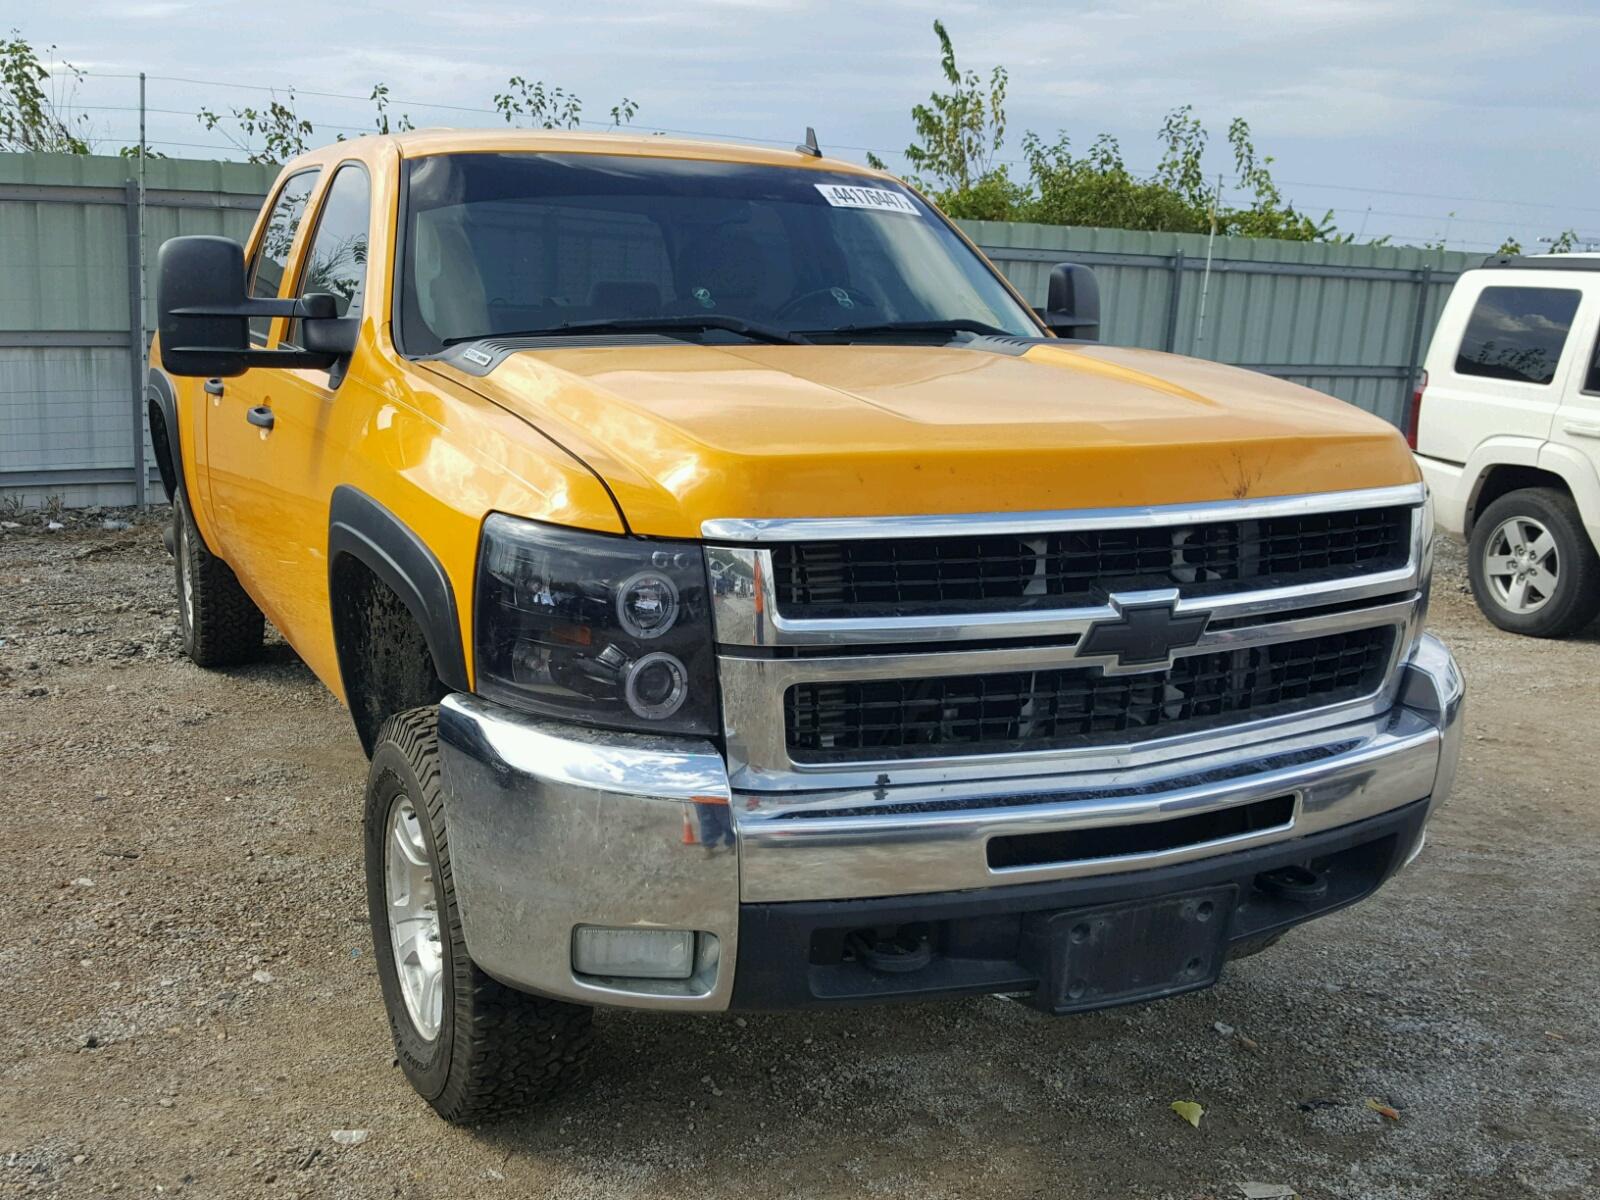 warranty clean lt youtube loaded crew silverado cab watch chevrolet